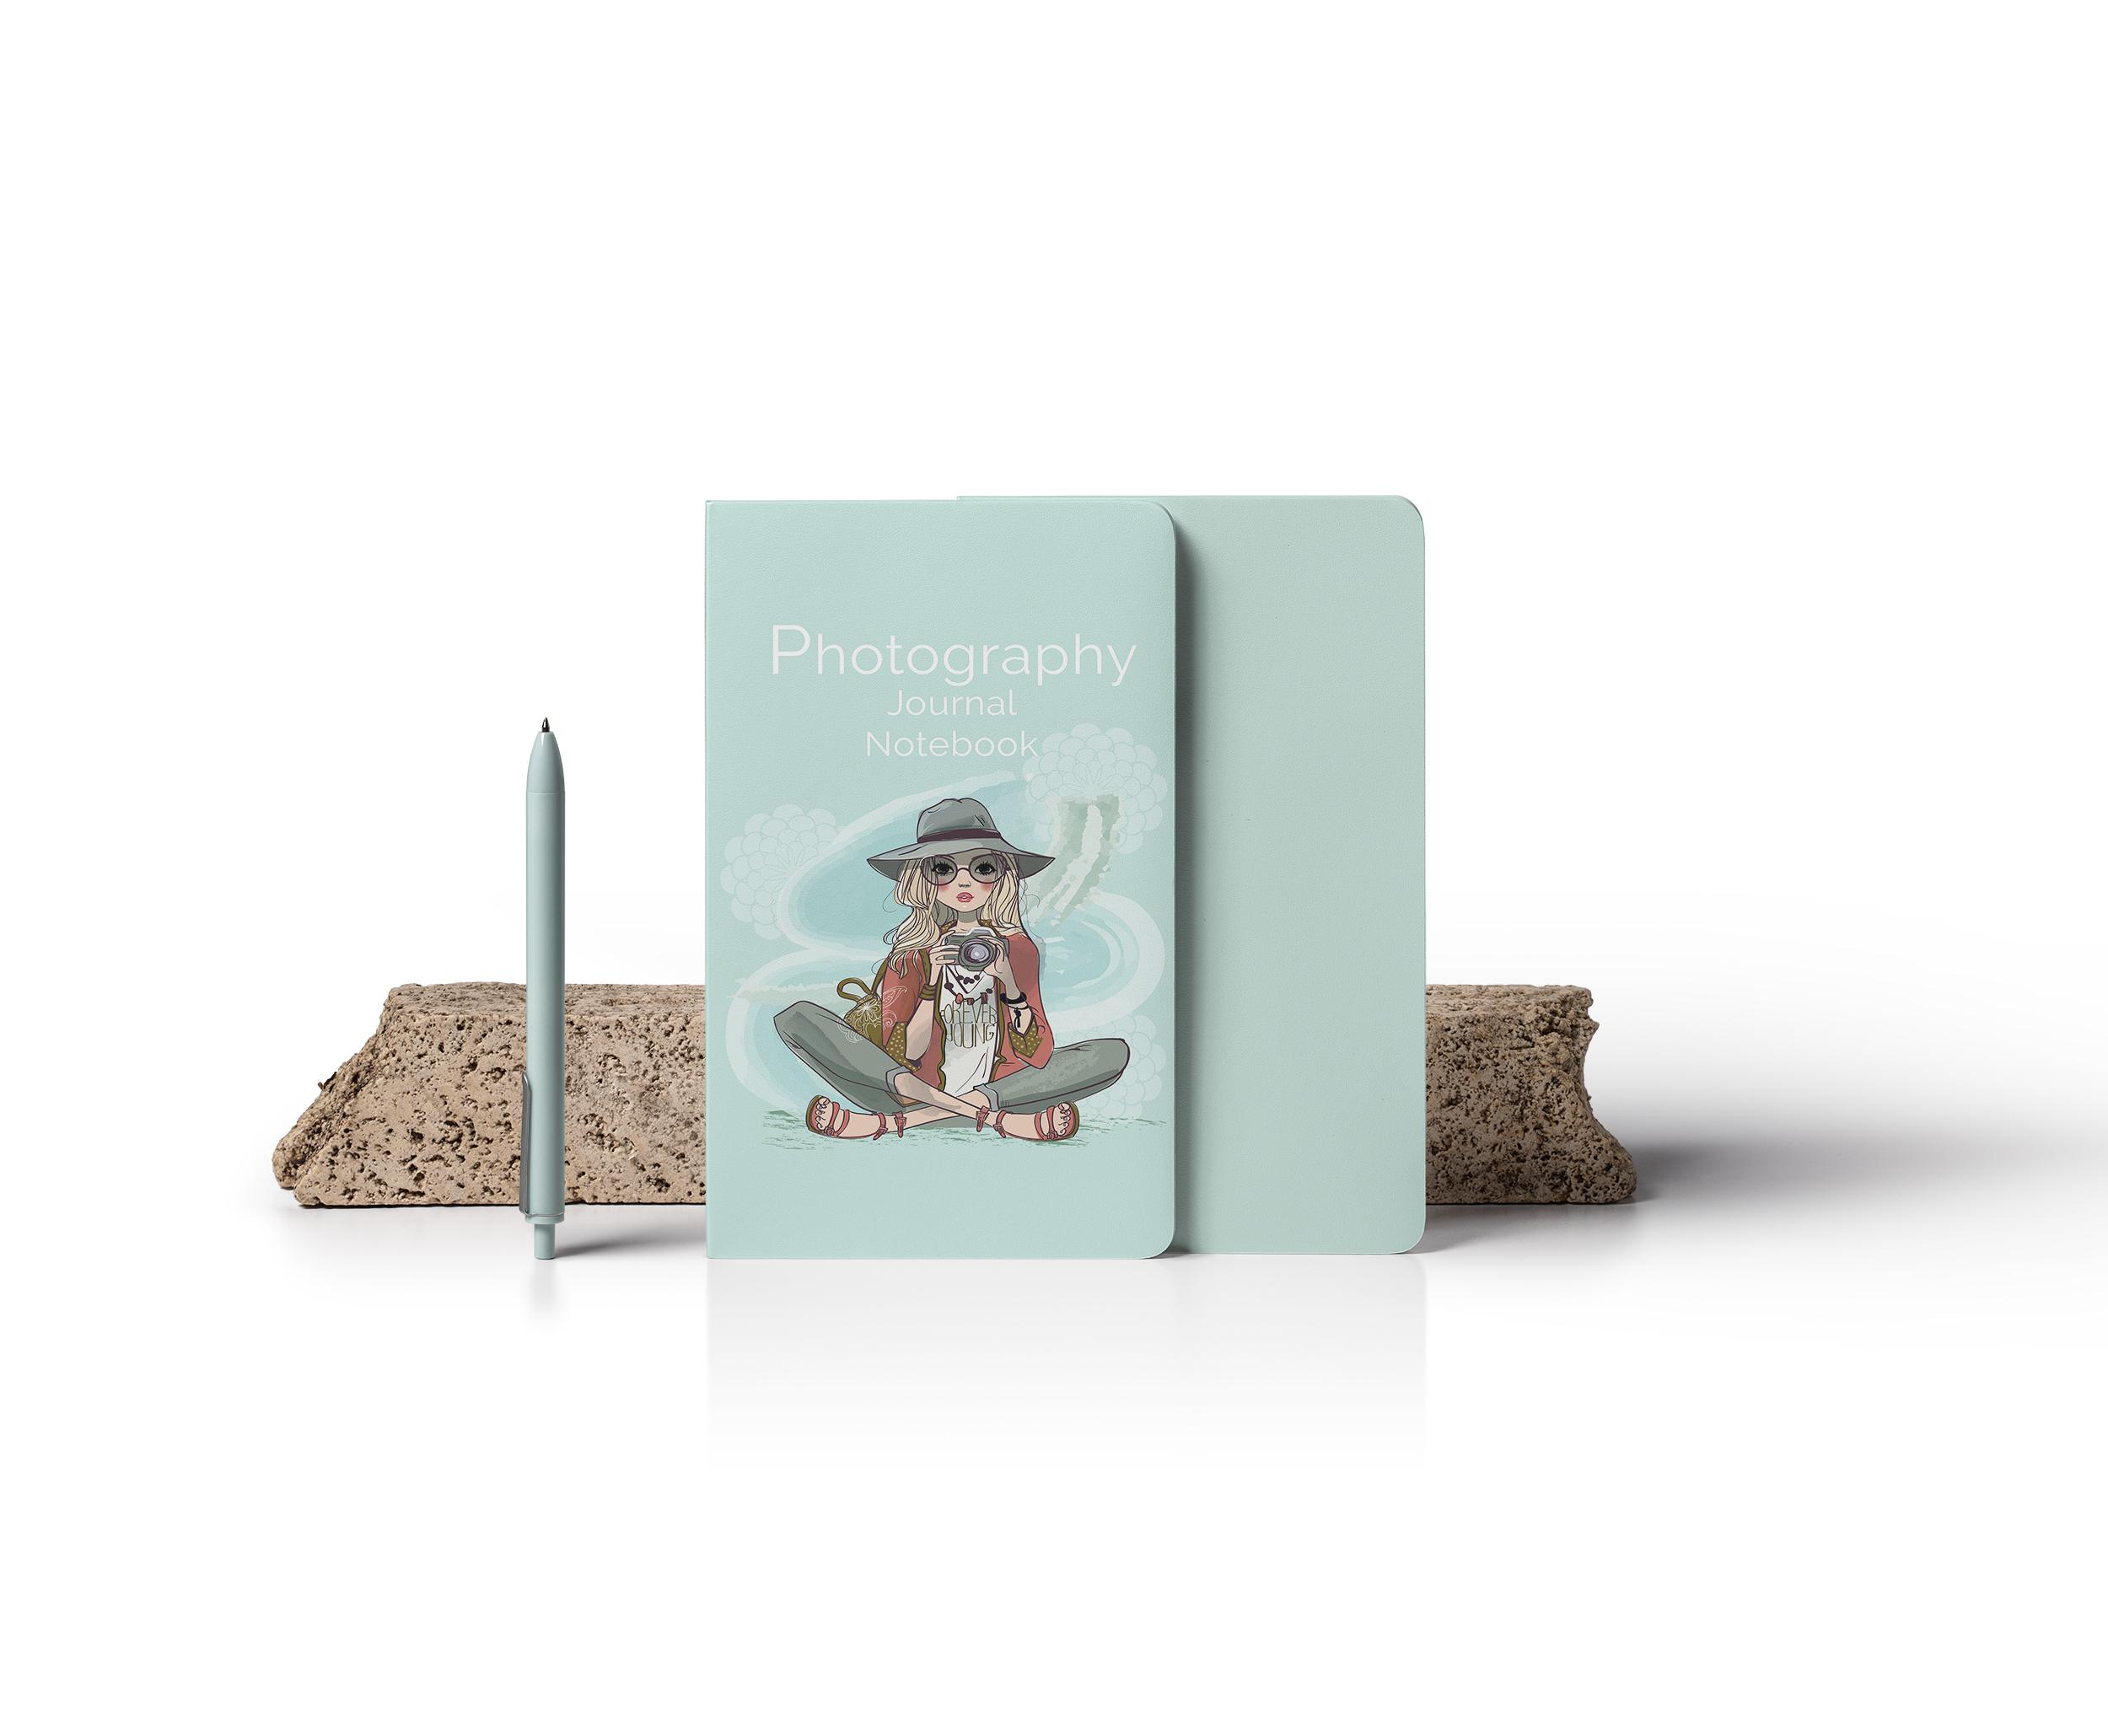 Photography Journal Notebook